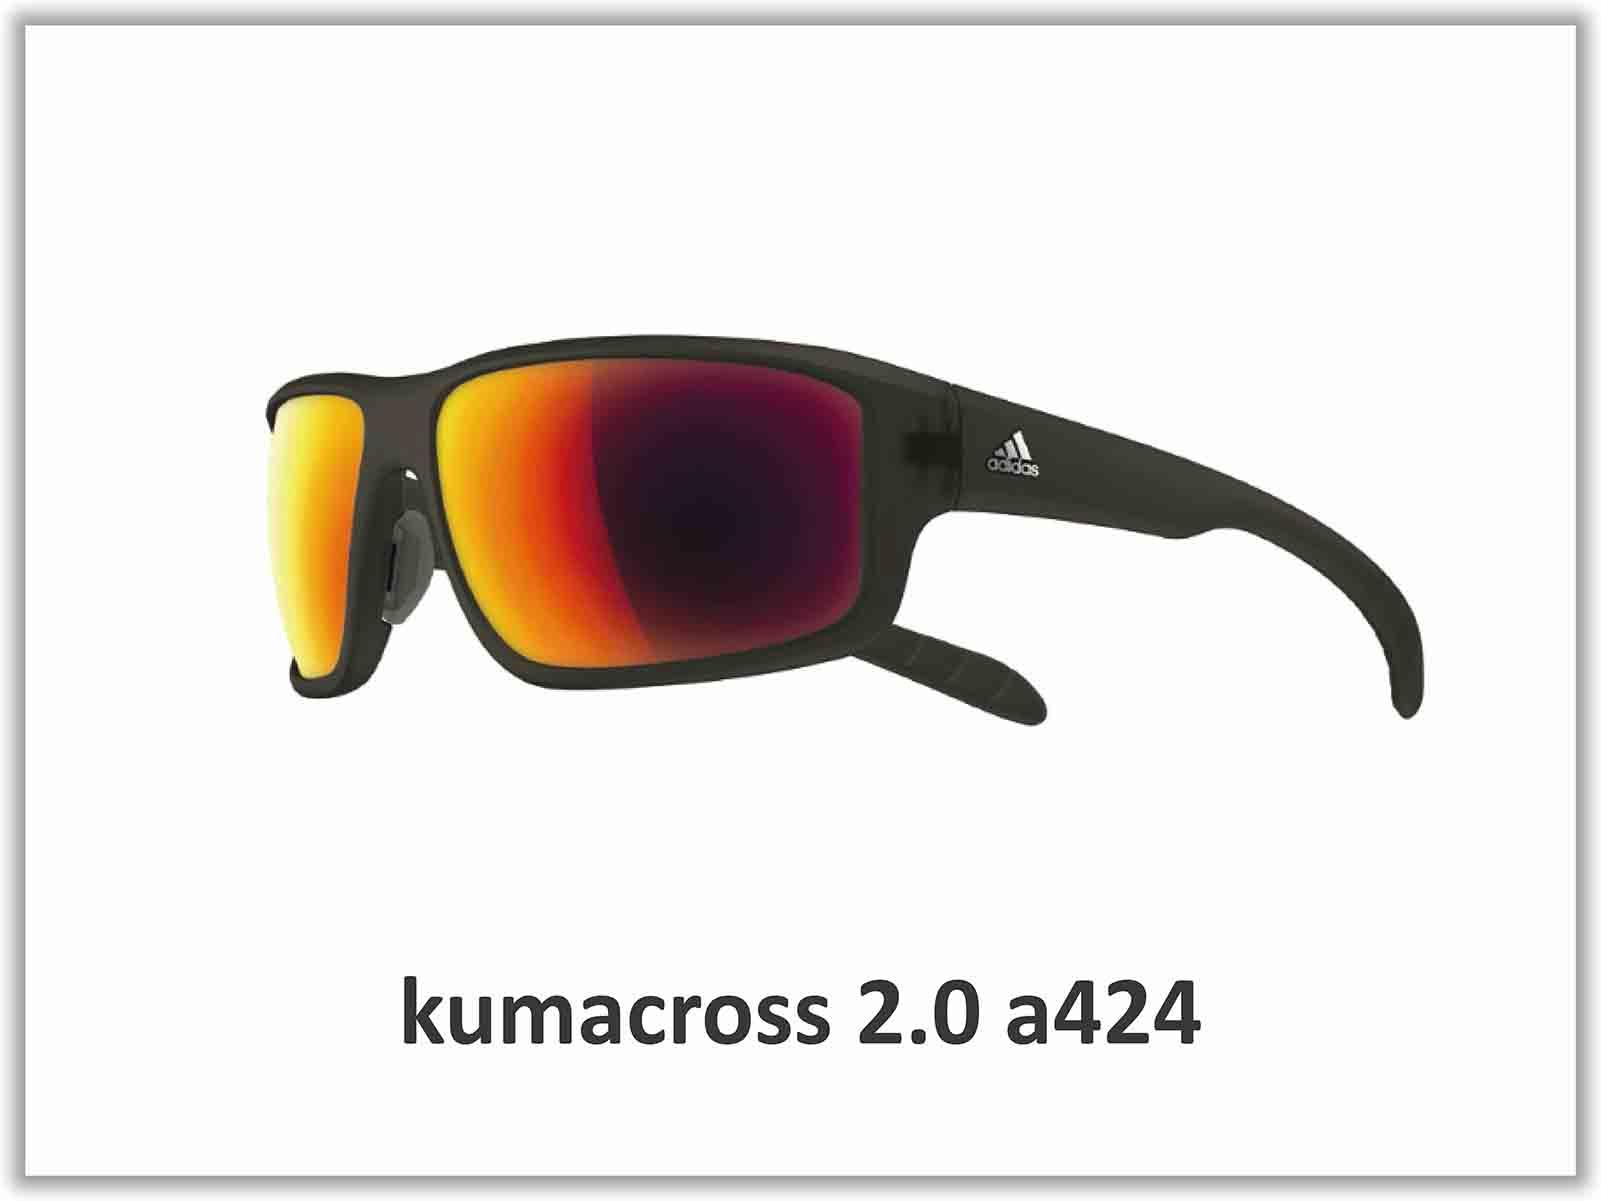 Kumacross-2.0-a42